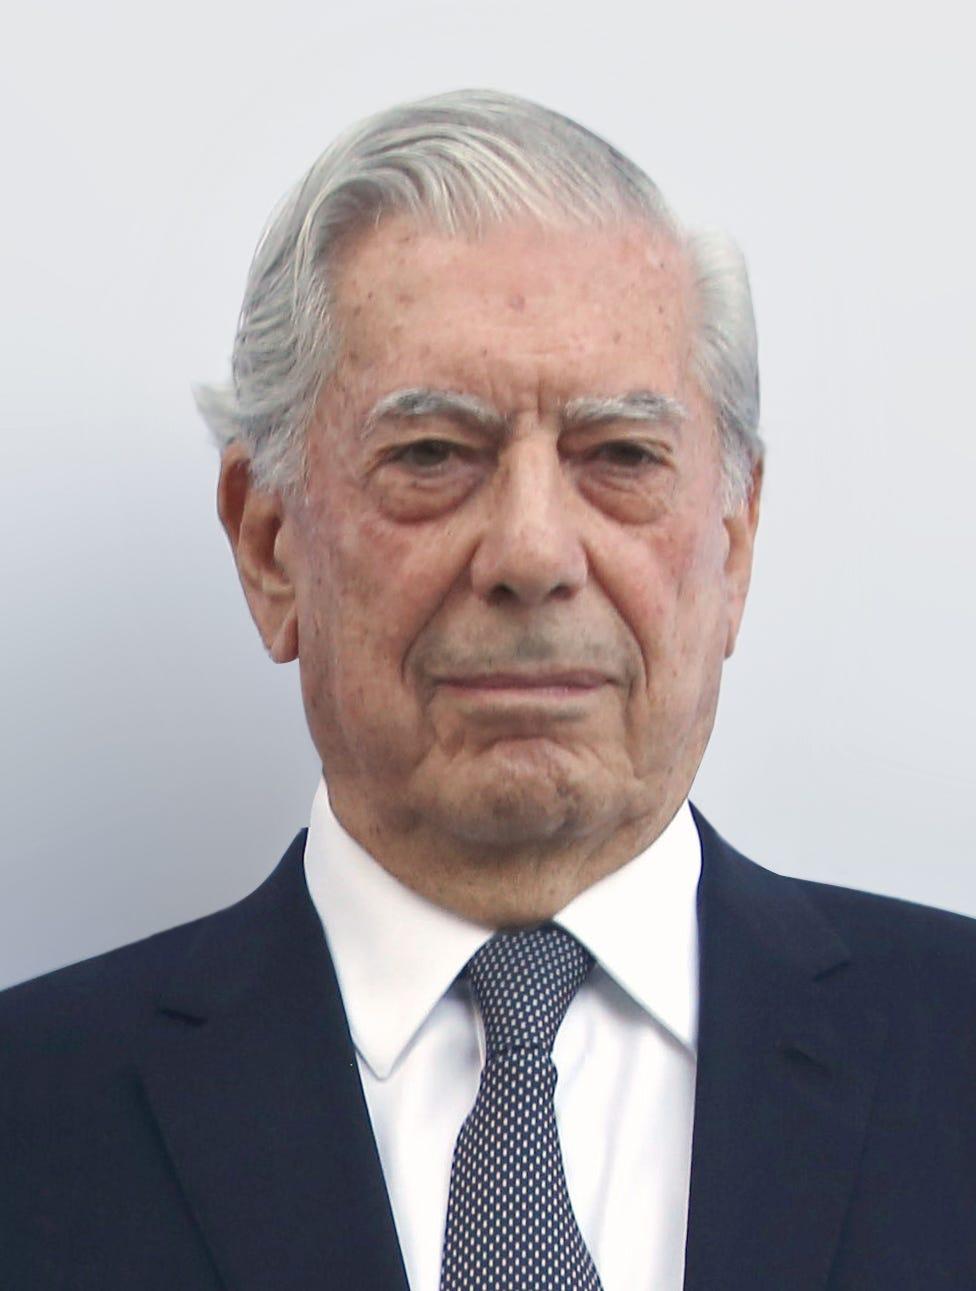 https://upload.wikimedia.org/wikipedia/commons/b/bf/Mario_Vargas_Llosa_%28crop_2%29.jpg